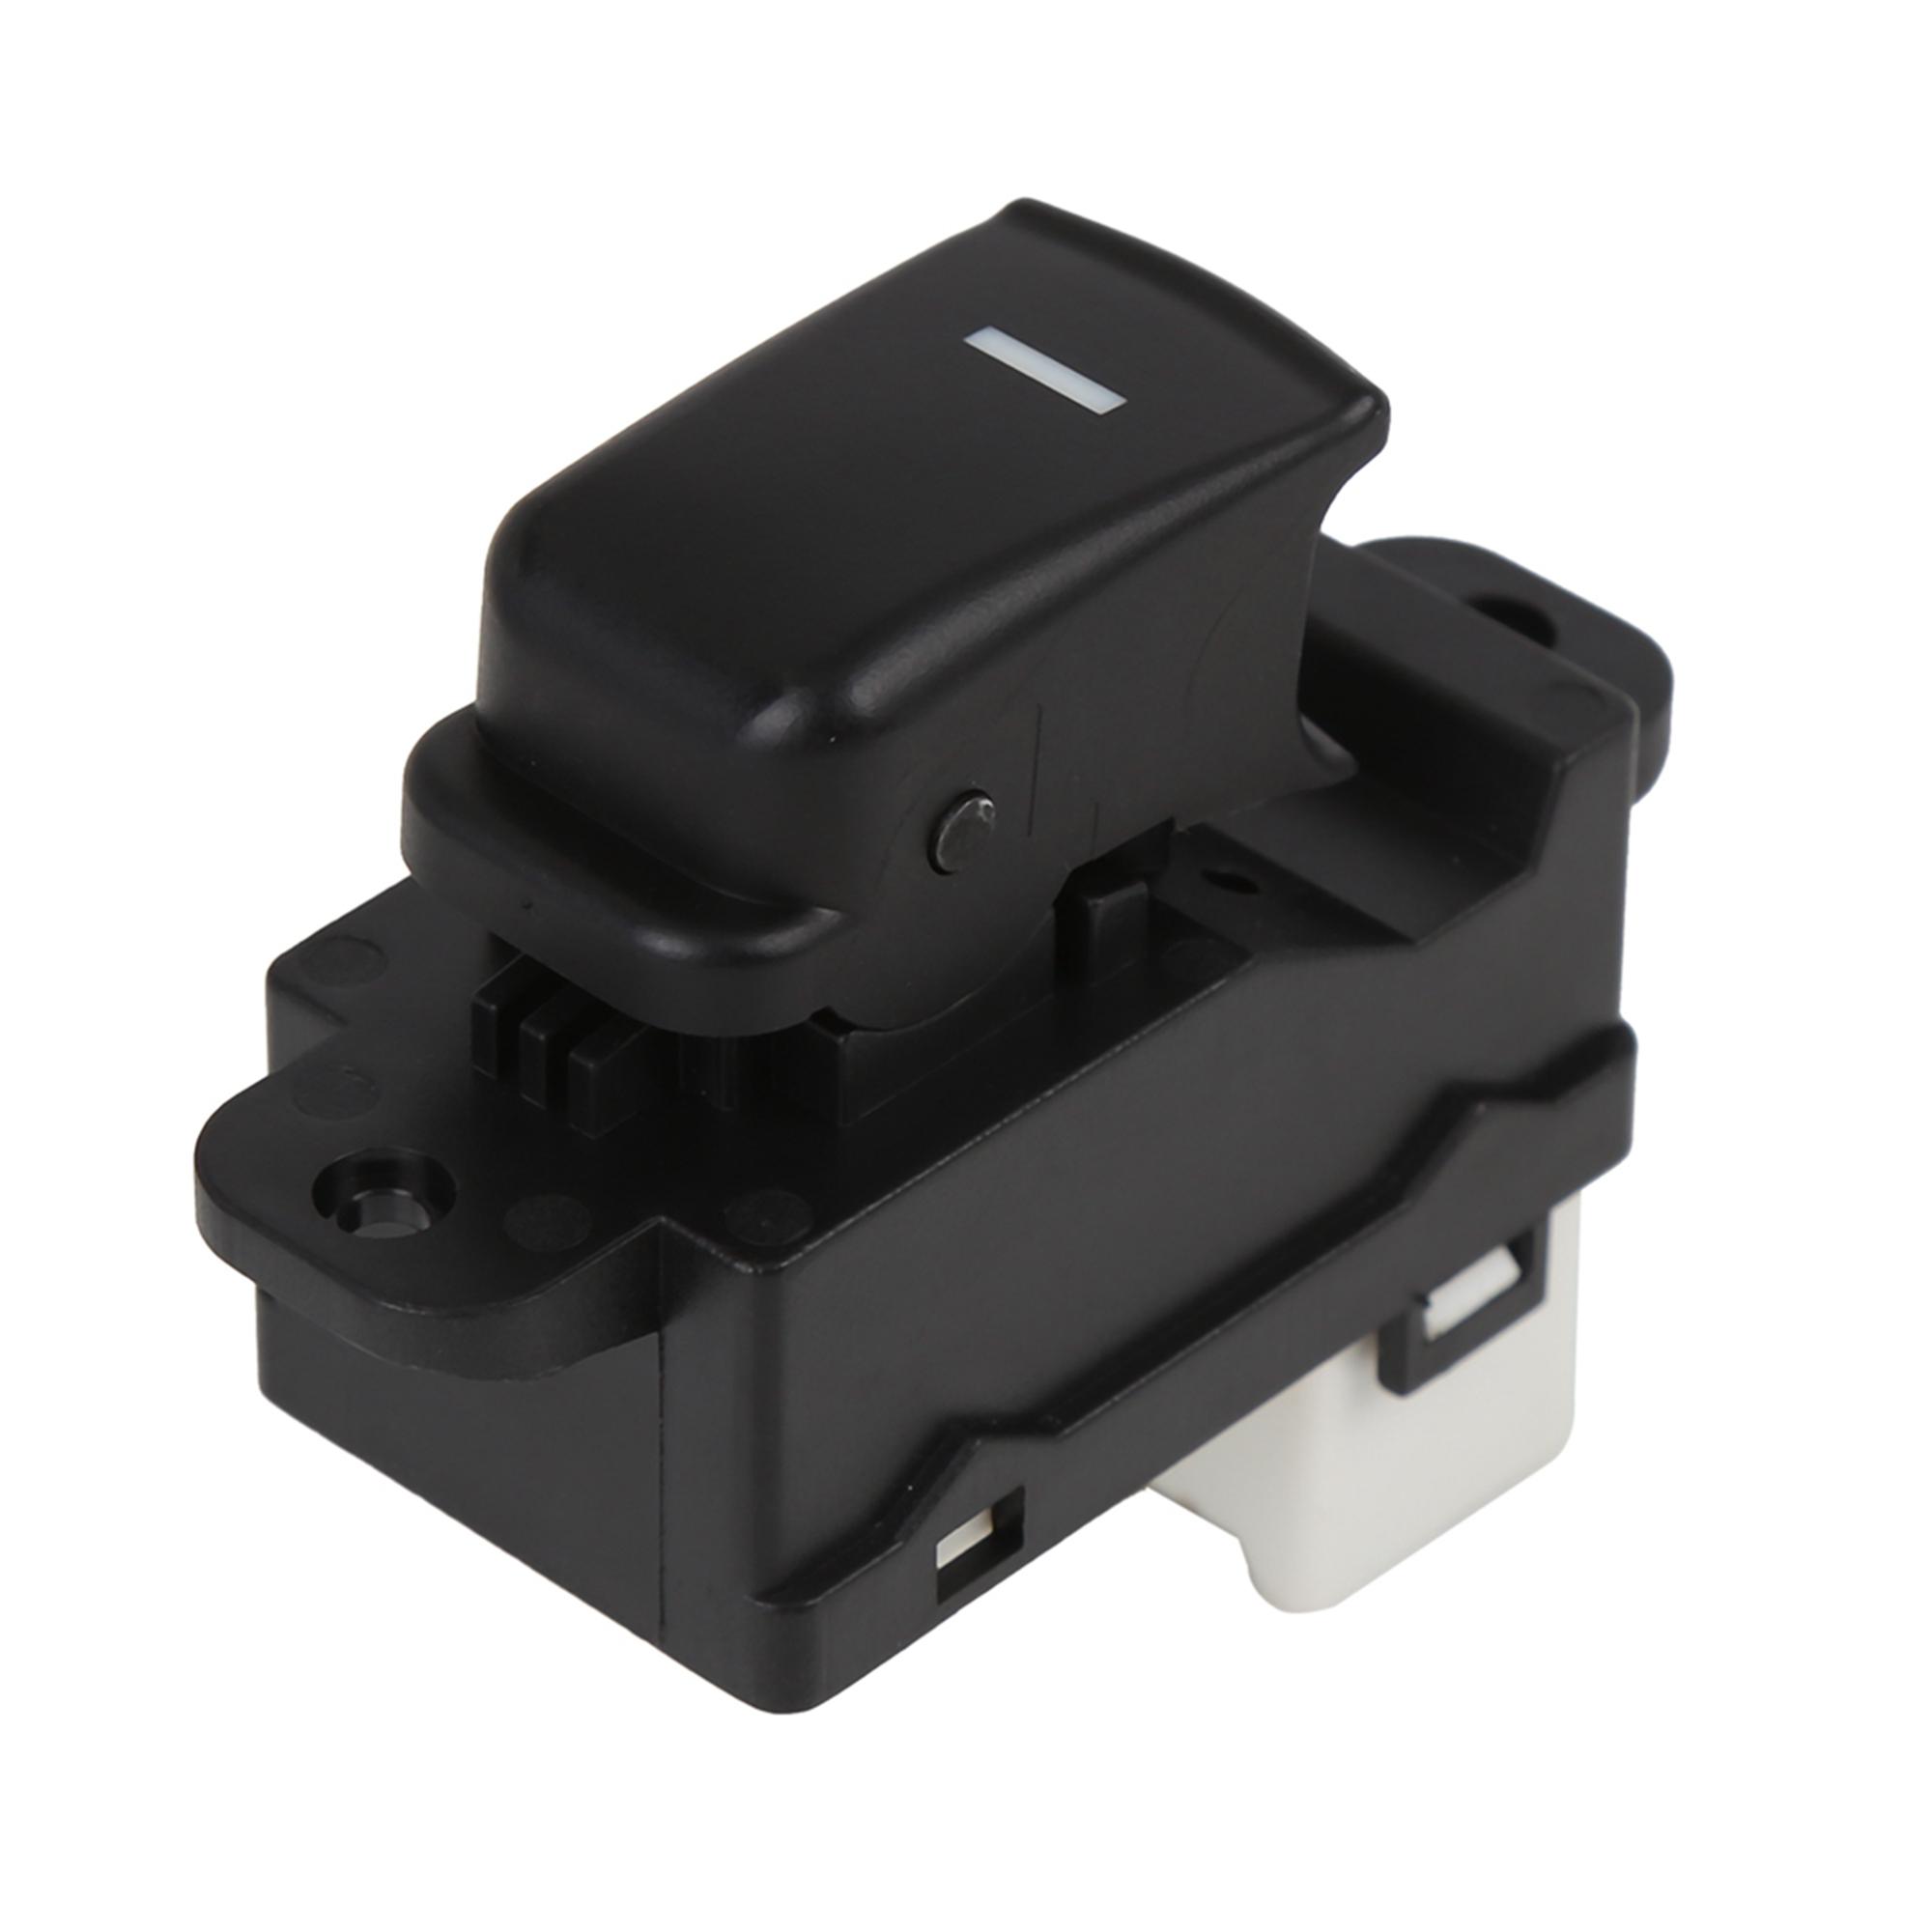 93580-3K500 Car Window Lifter Electrical Control Switch for Hyundai Sonata